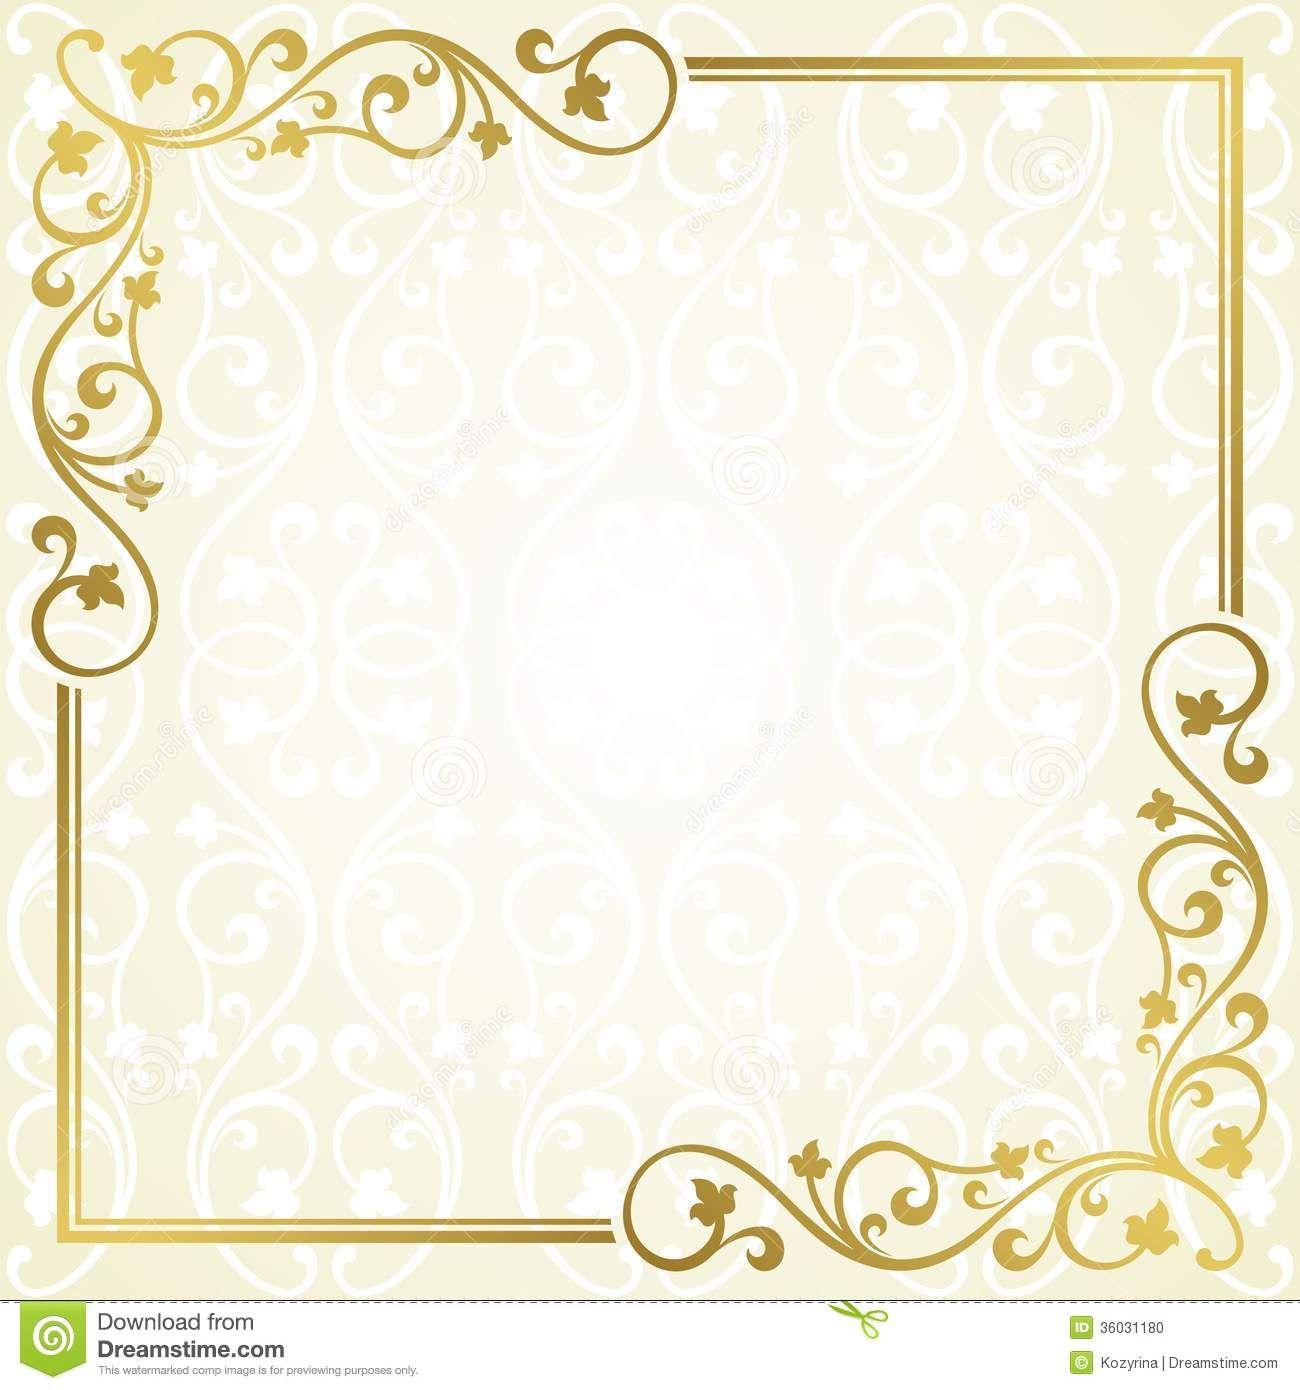 Empty Invitation Cards Plain Wedding Invitations Free Invitation Cards Marriage Invitation Card